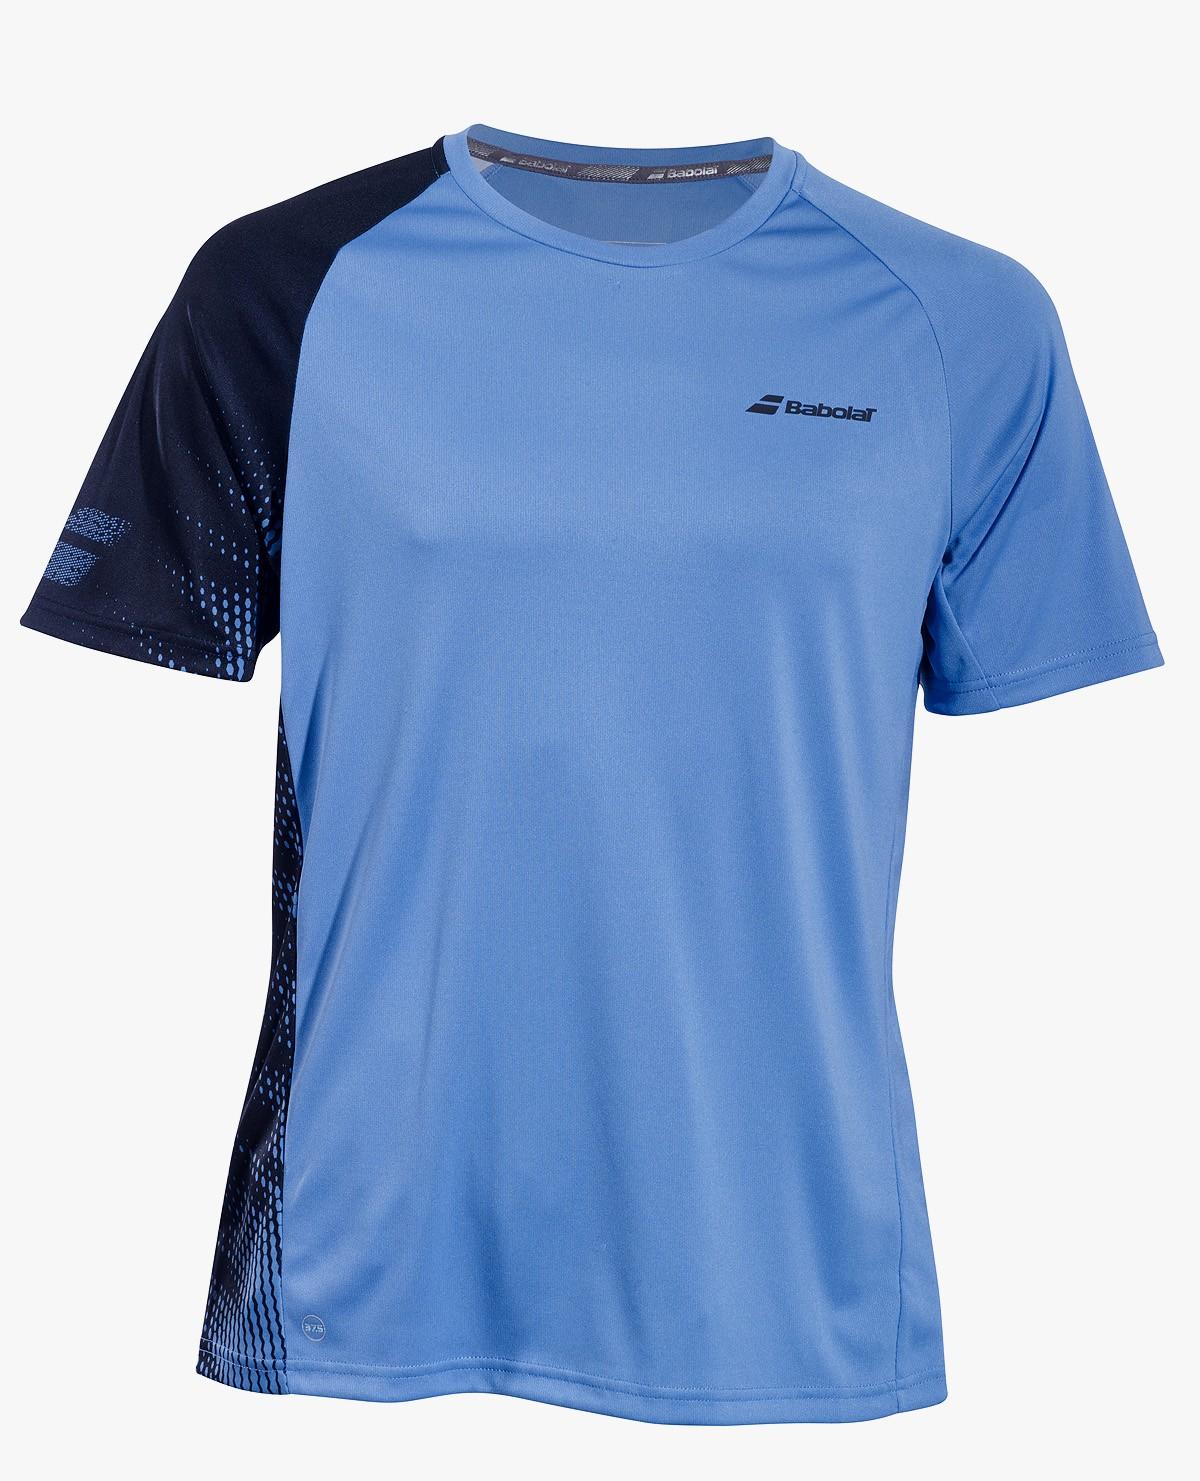 Koszulka tenisowa Babolat PERF T-shirt Parisian Blue -45%